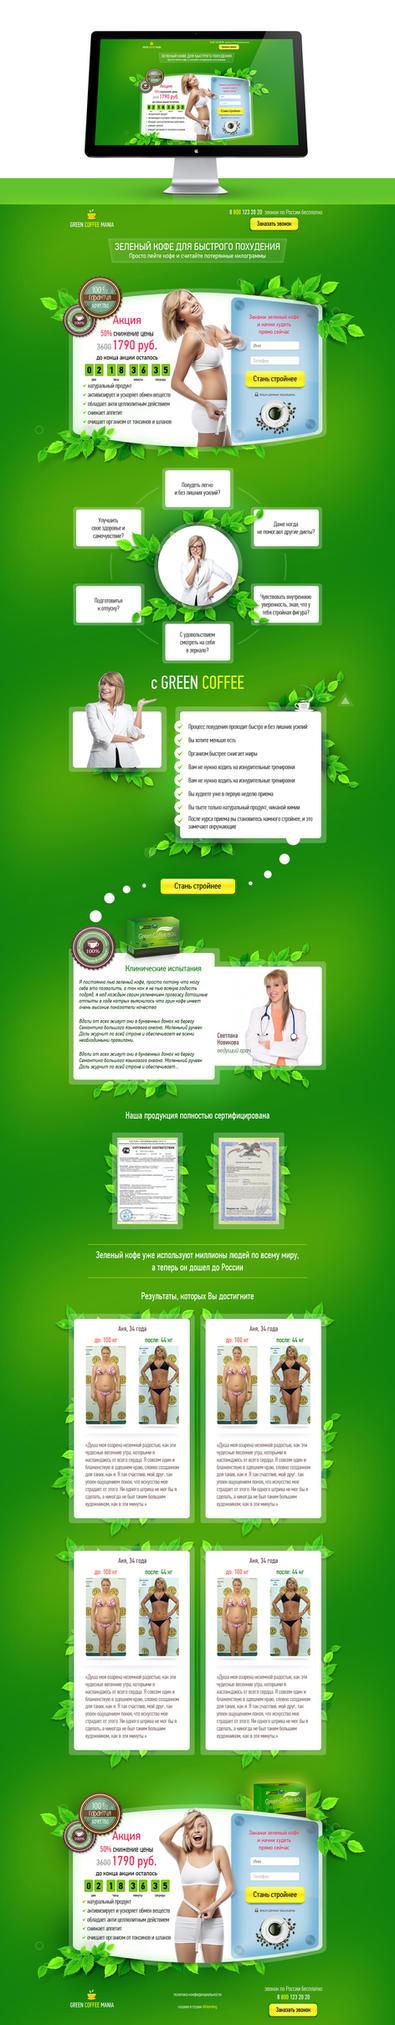 Landing Page (GREEN COFFEE MANIA) by Roamn